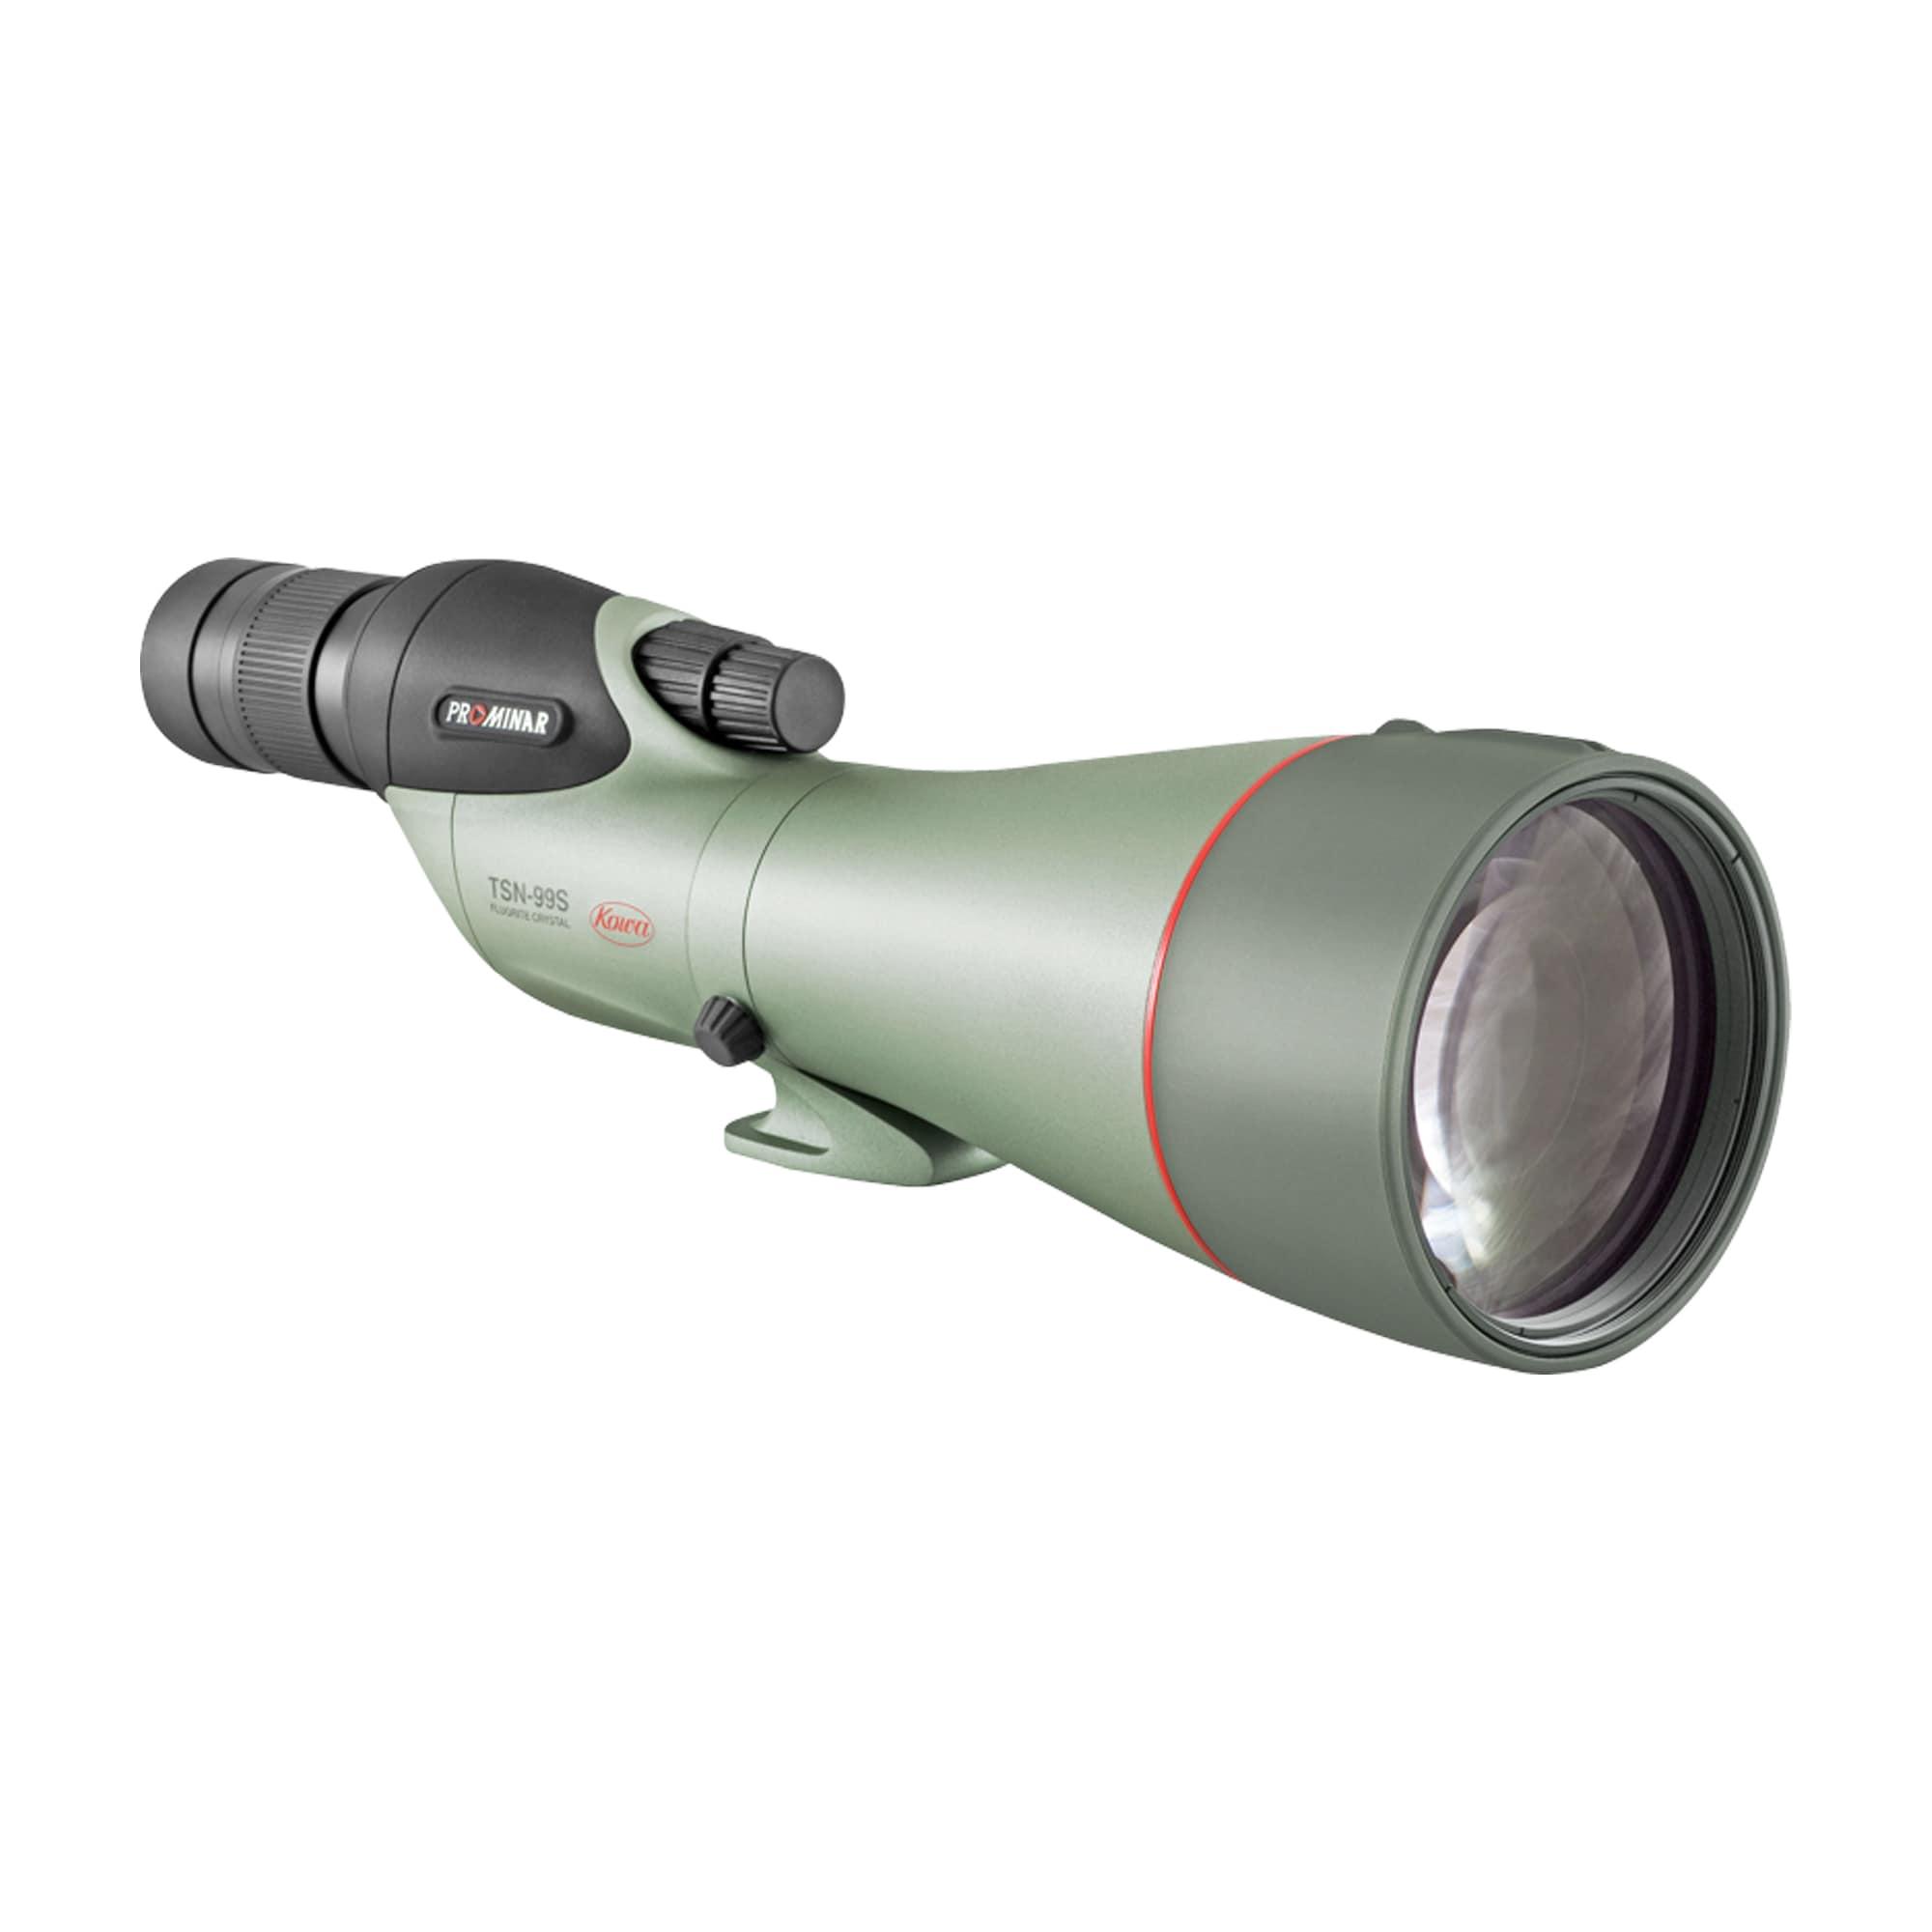 Kowa Spottingscope TSN-99S PROMINAR + 30-70X Wide okular